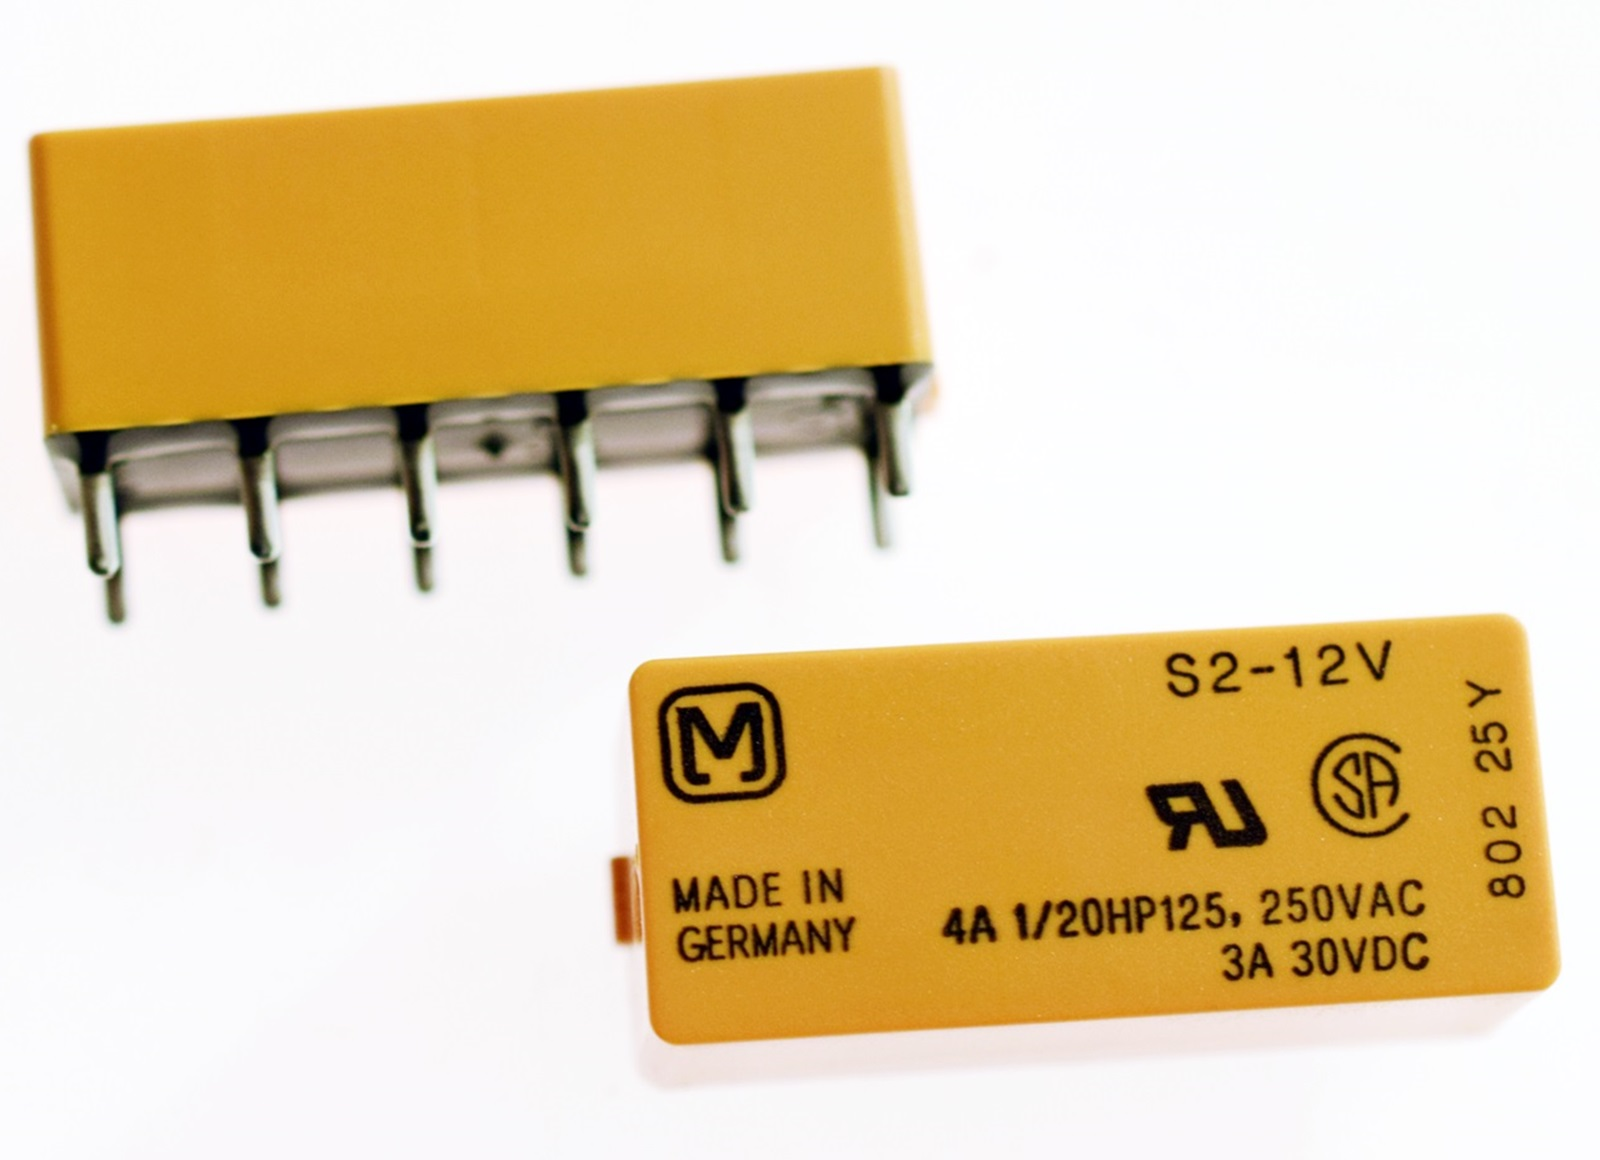 4A 12Vdc DPDT 2-poliger Wechsler #715876 Panasonic S2-DC12V Signal//Print Relais